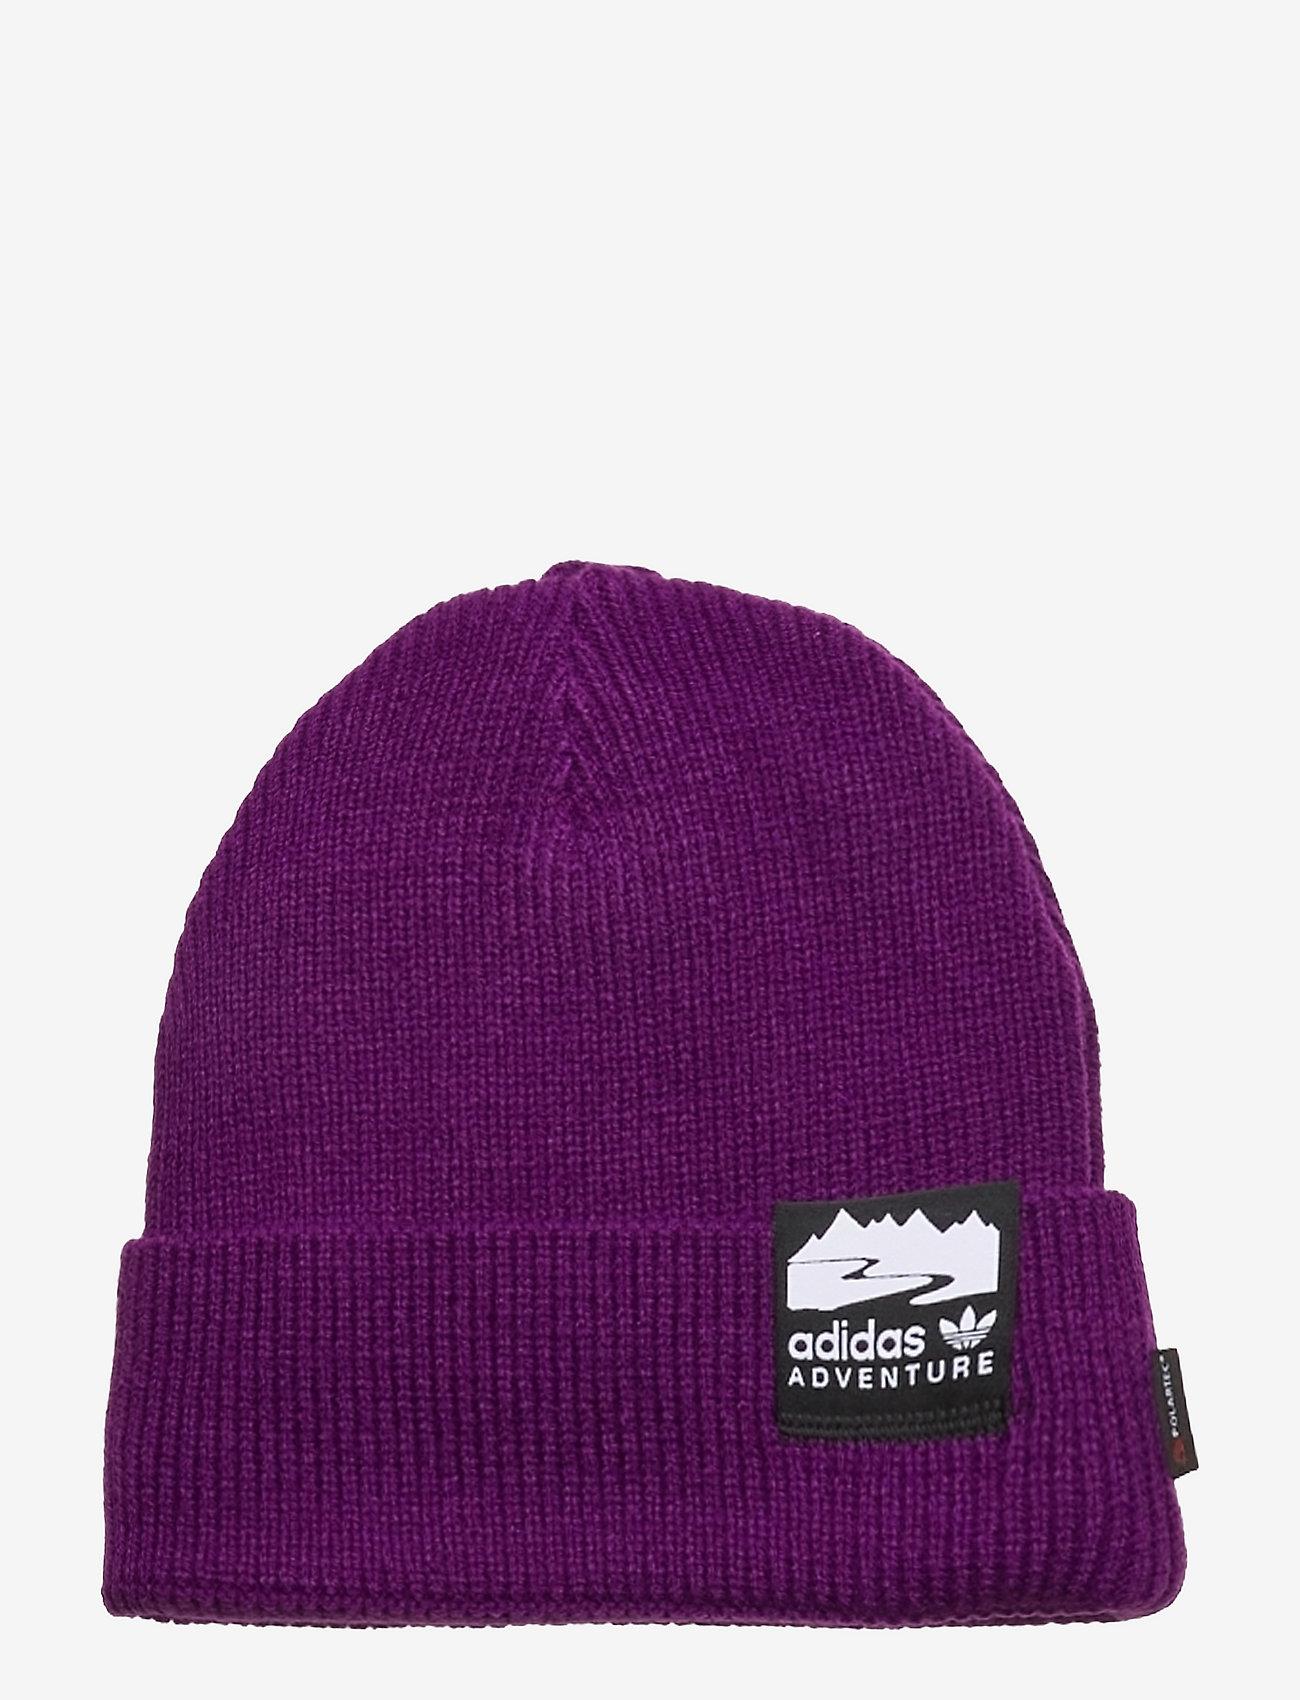 adidas Originals - Adventure Beanie - bonnet - gloprp - 0